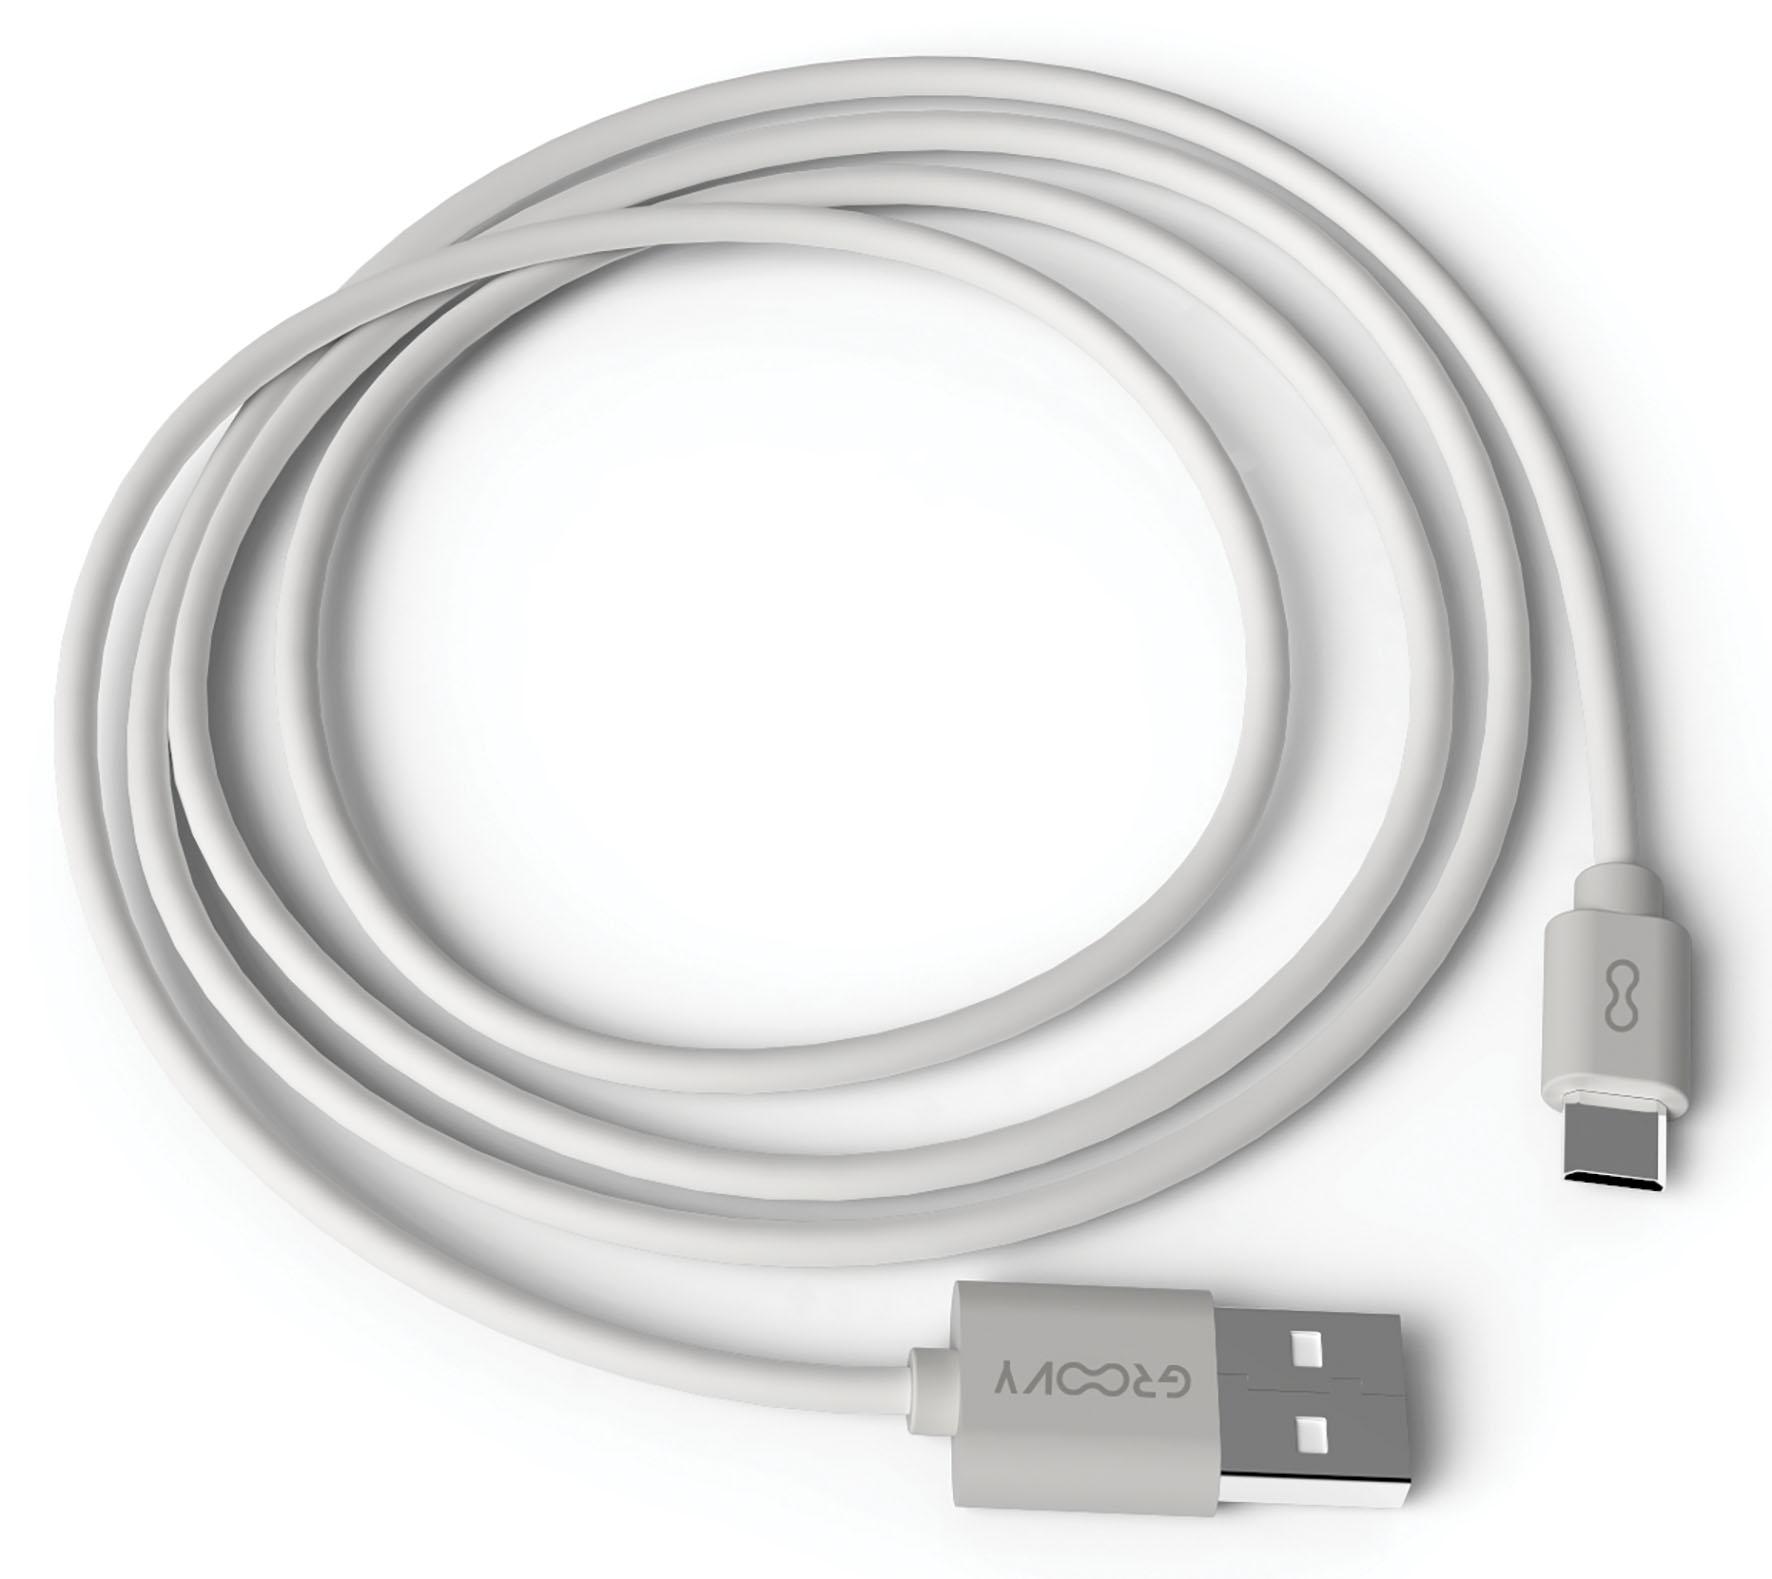 CAVO RICARICA MICRO USB ASS